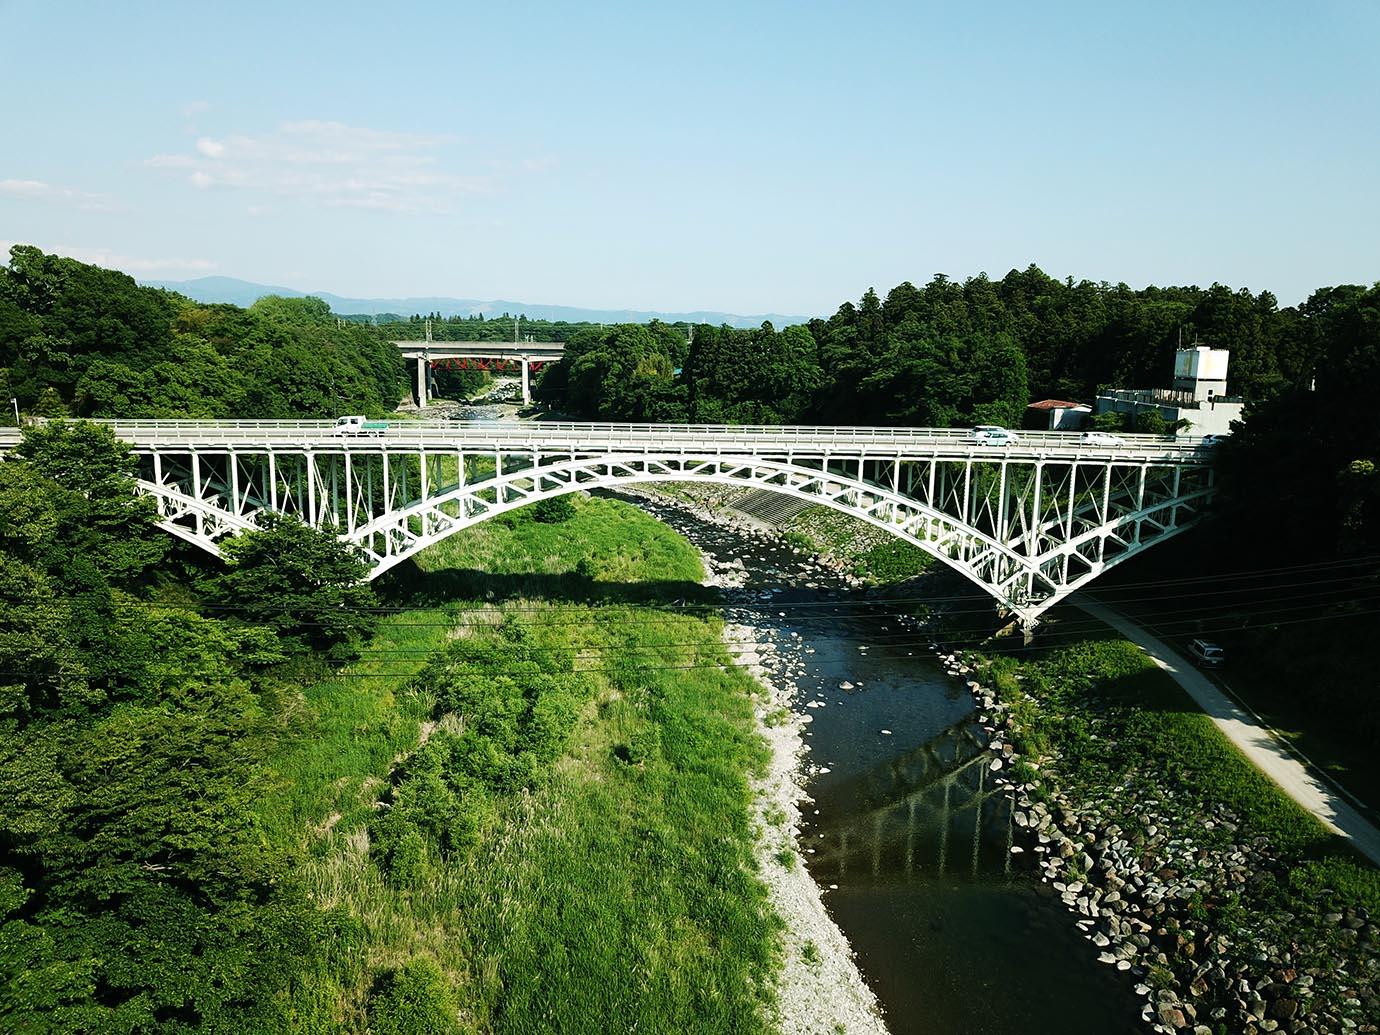 drone-superb-view-kuroiso-nakagawa5